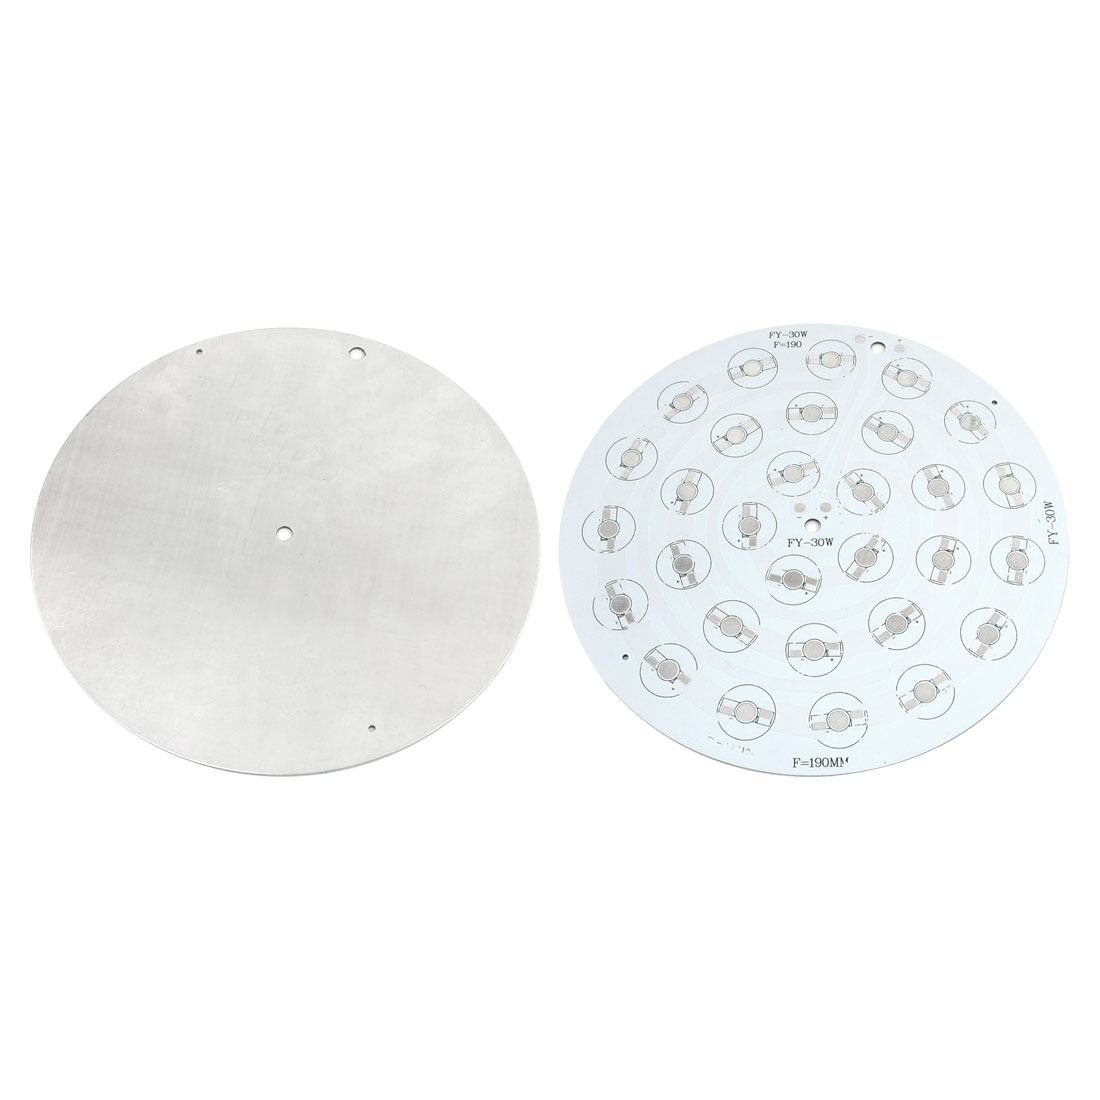 2Pcs 30 x 1W 3W LED High Power Circle Aluminum PCB Circuit Board 190mm Diameter